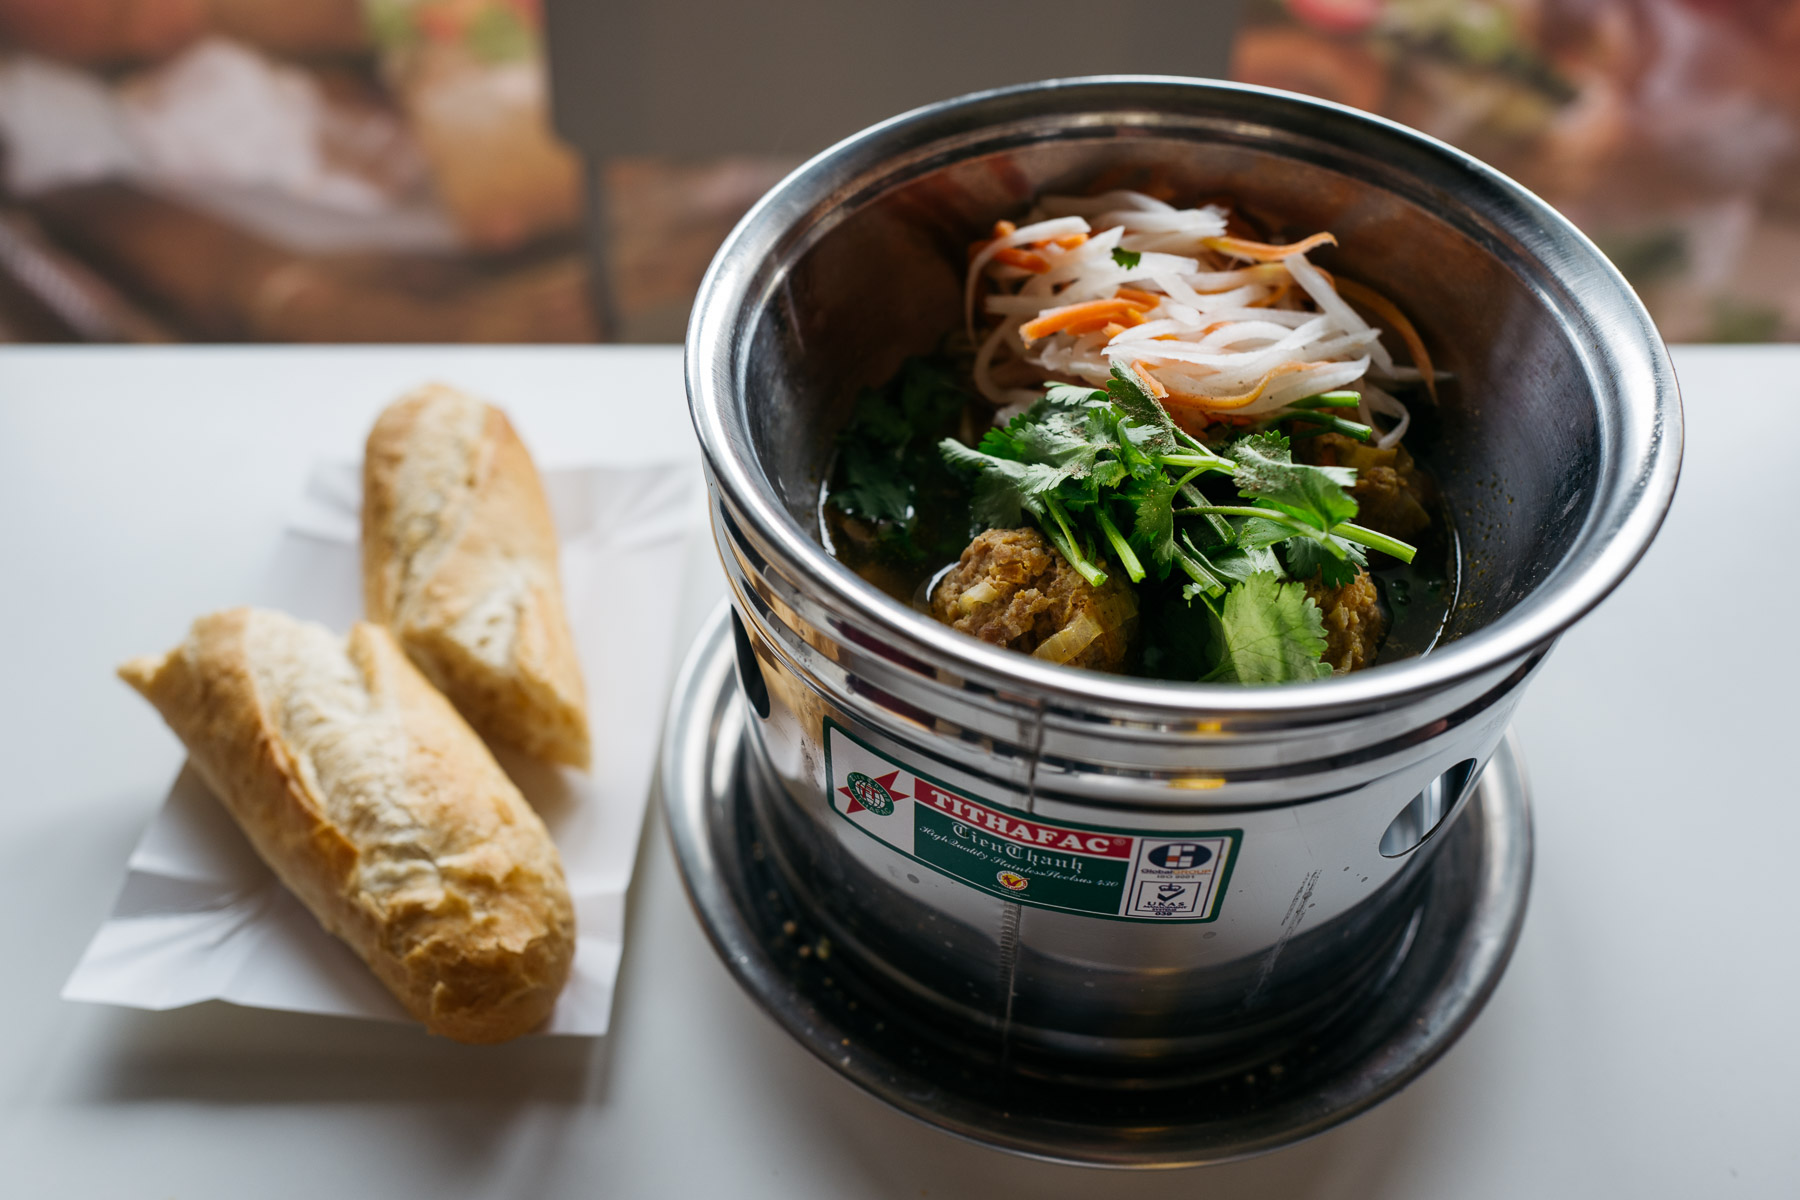 Mielone kulki wieprzowe + szynka wietnamska (Banh mi Viet)